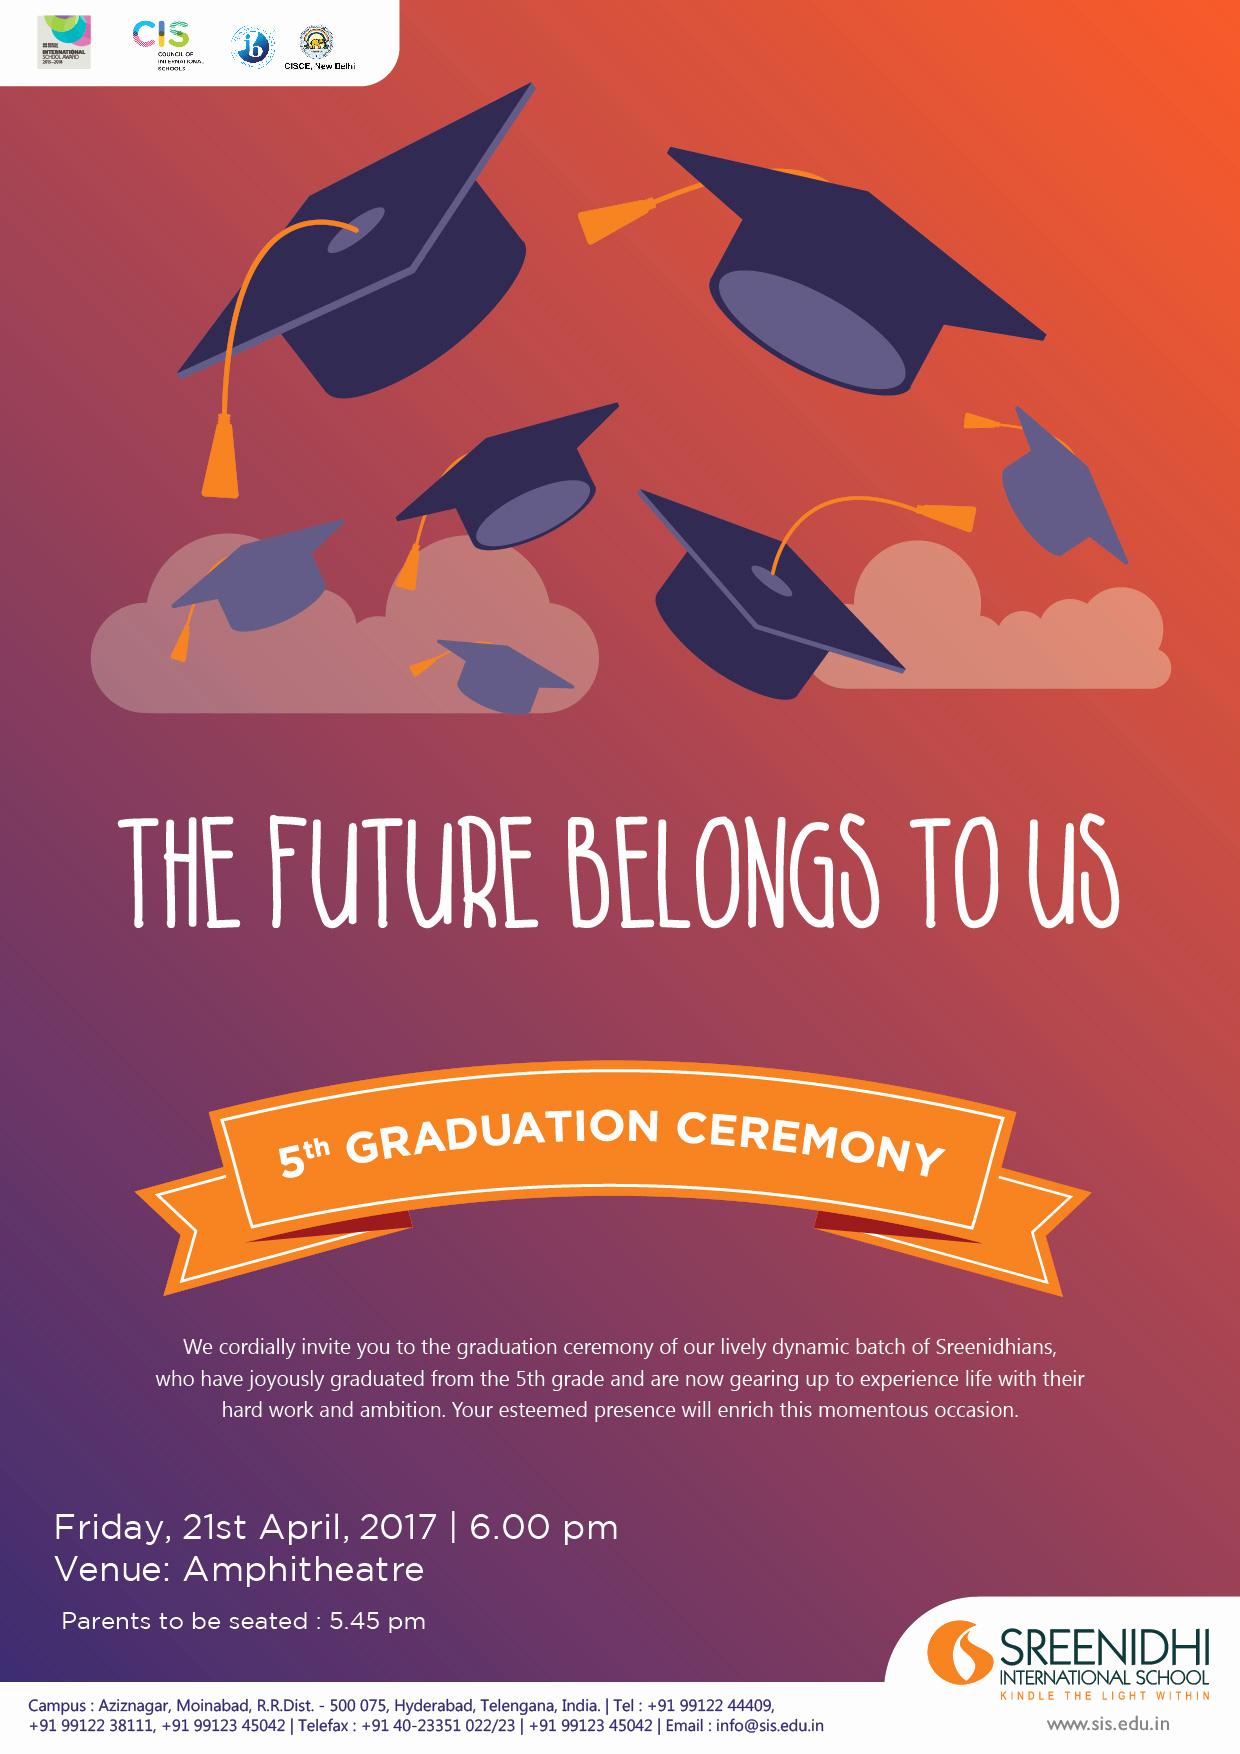 Graduation Ceremony Invitation Letter New Sreenidhi International School